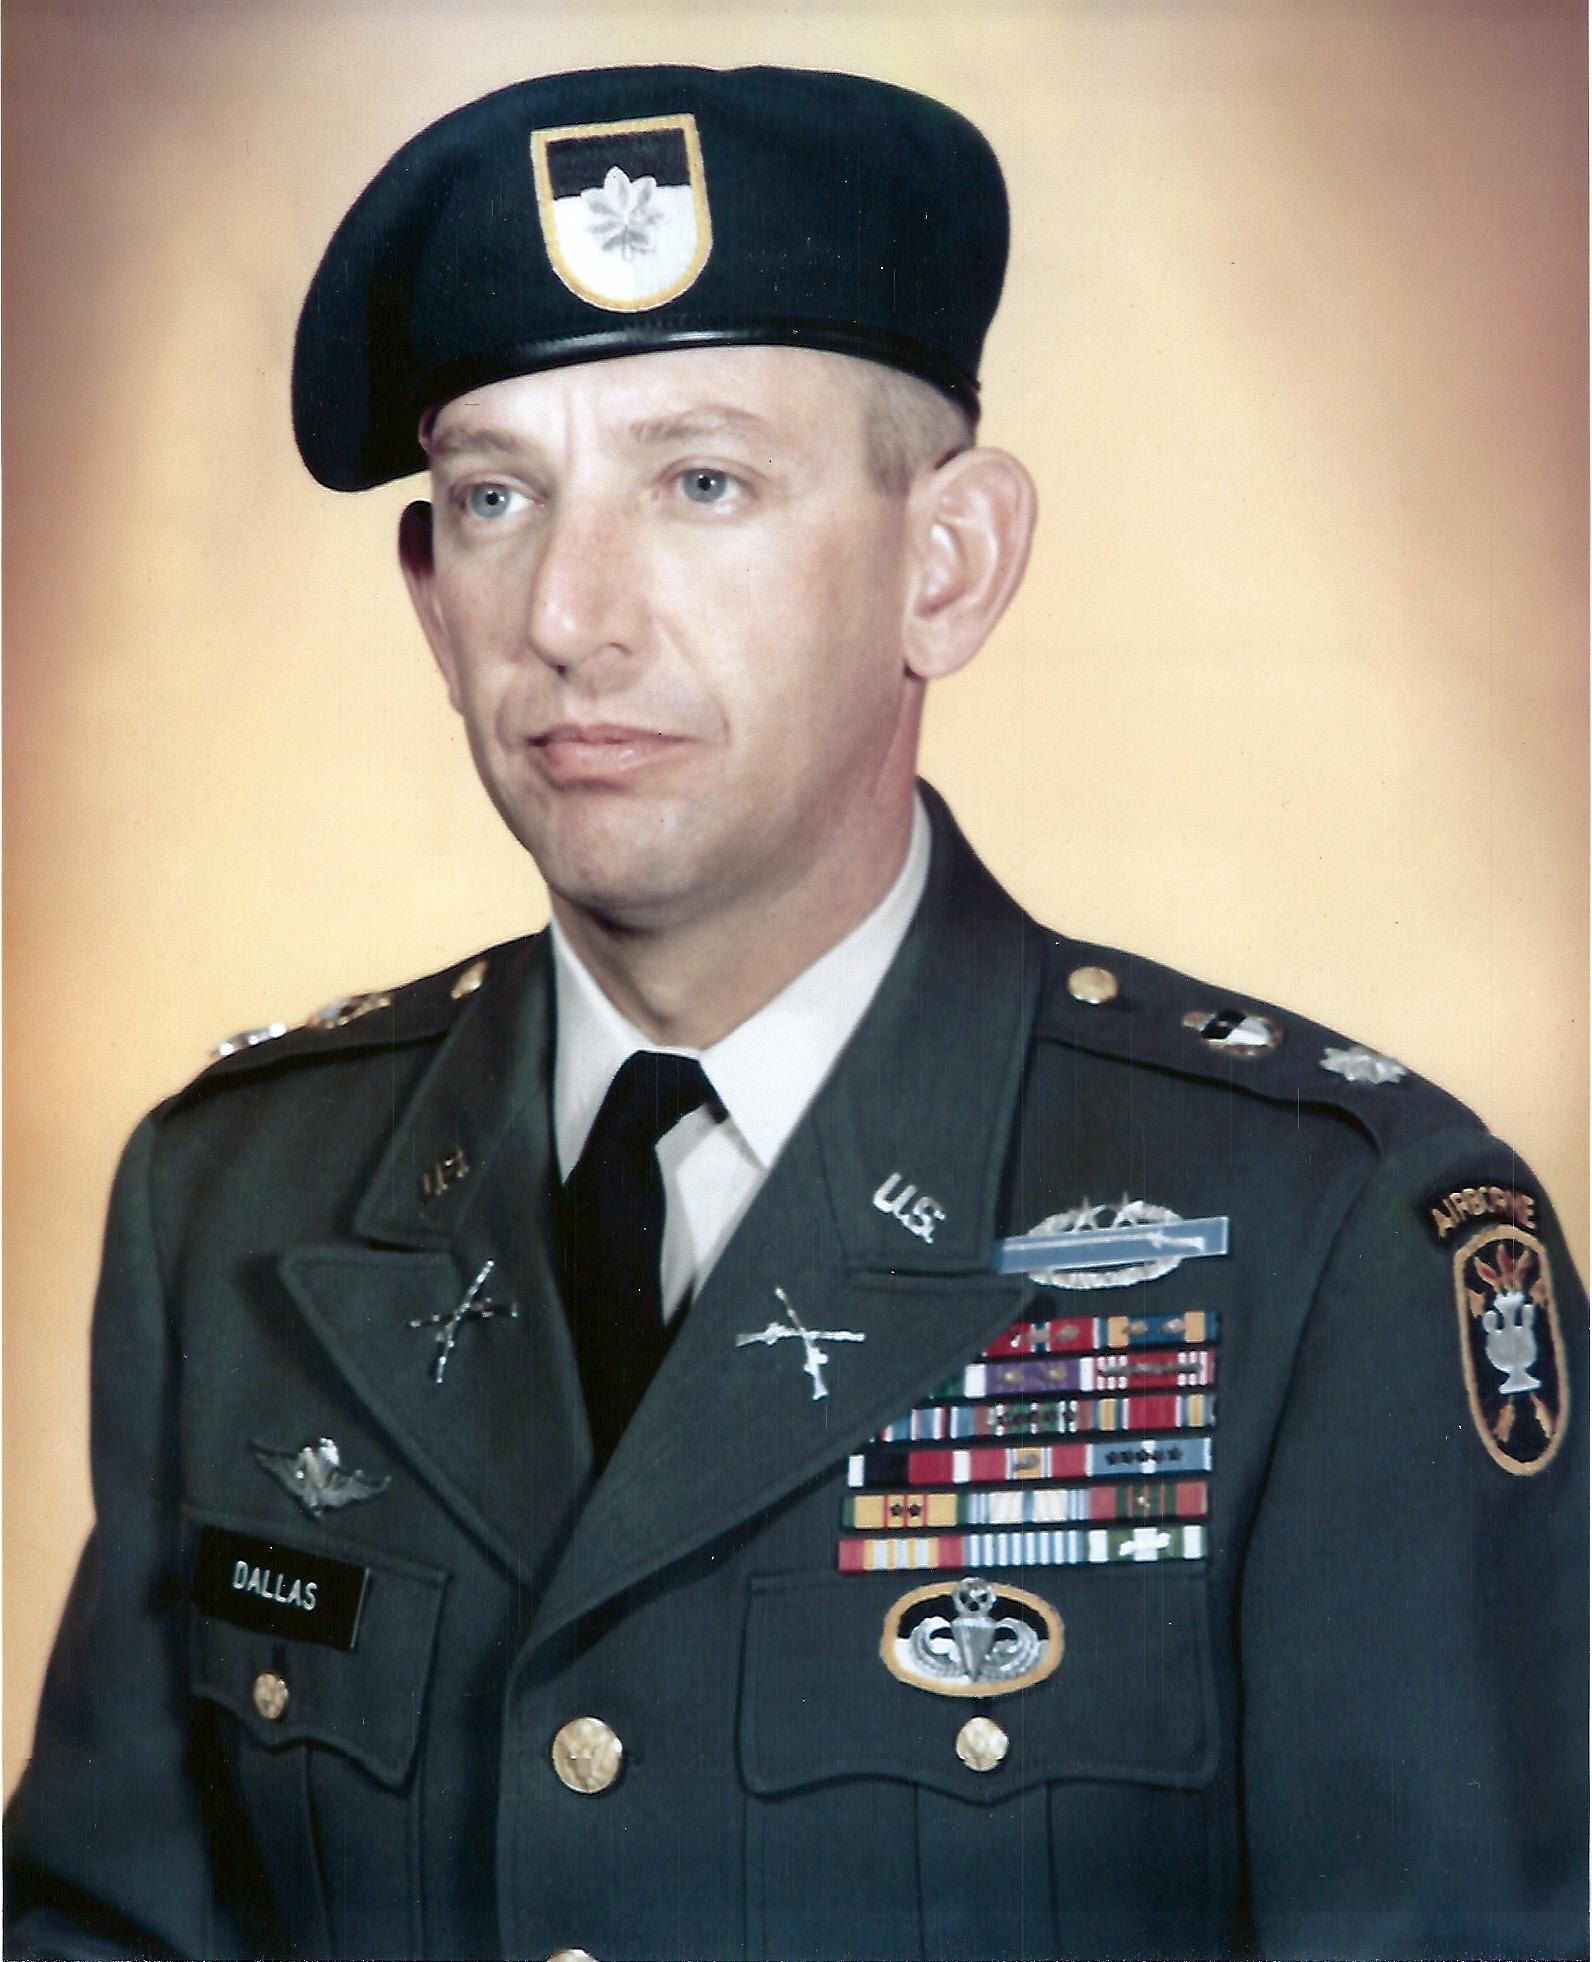 Ltc Frank J Dallas Special Forces Association Chapter 78